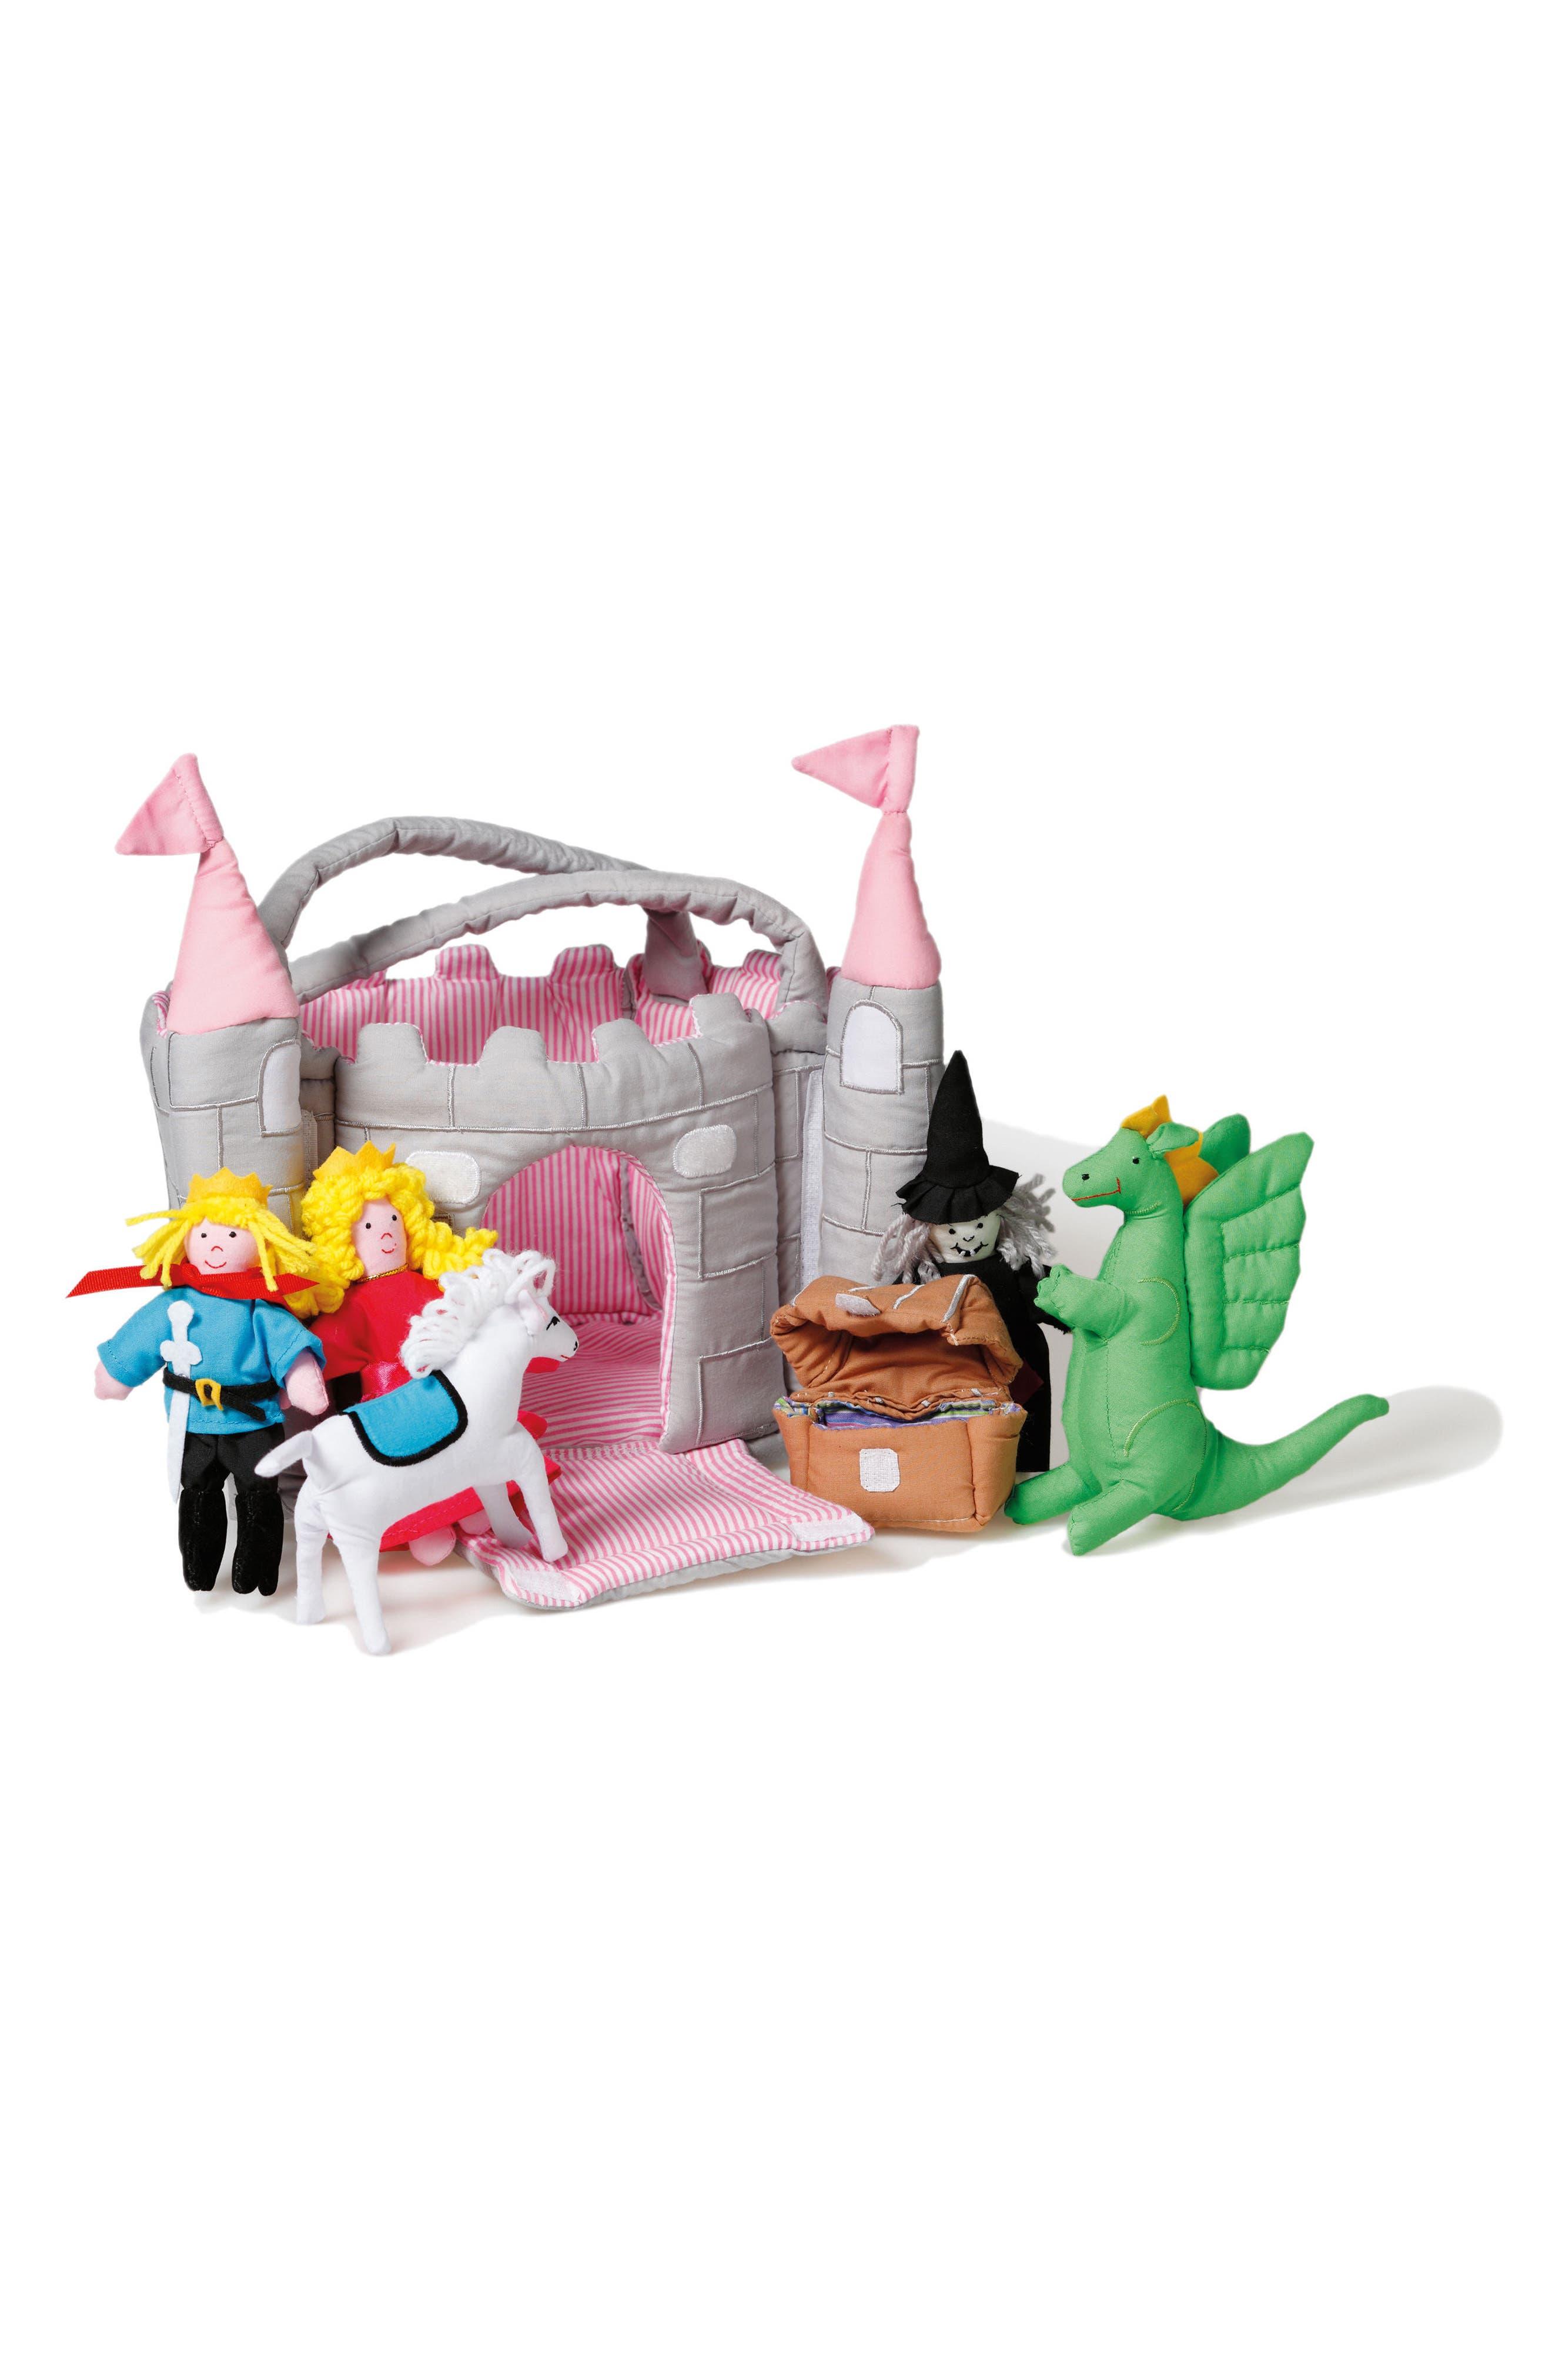 Main Image - oskar&ellen Pink Towers Castle Play Set